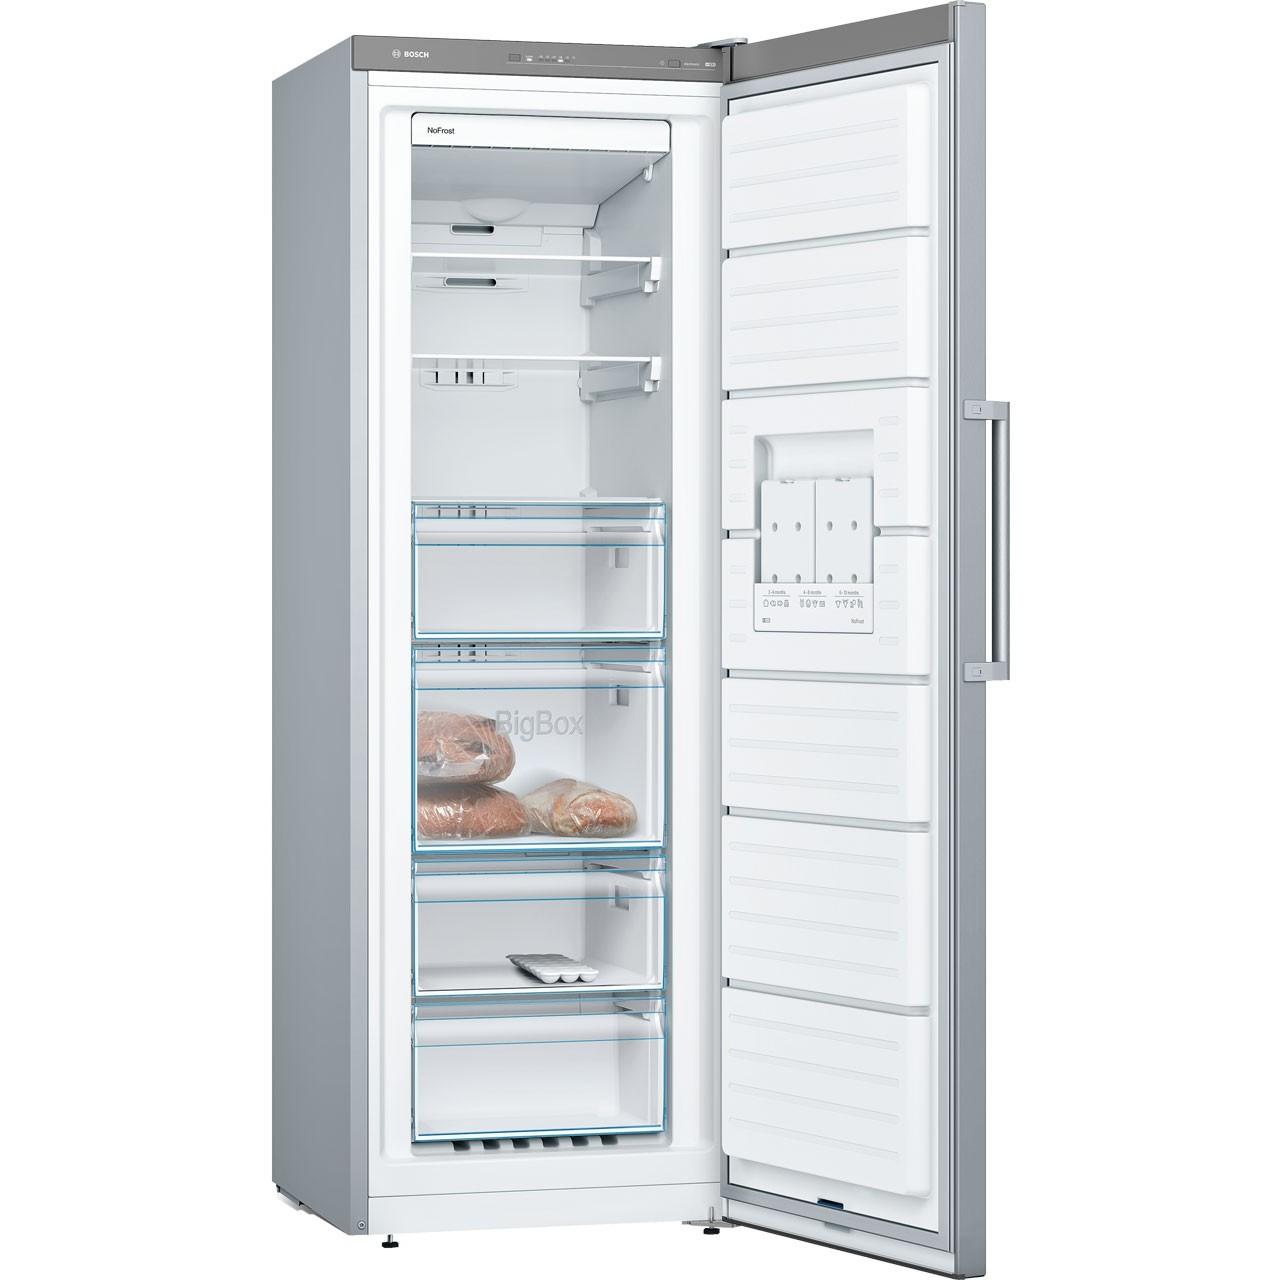 Bosch GSN33VL3P Freezer